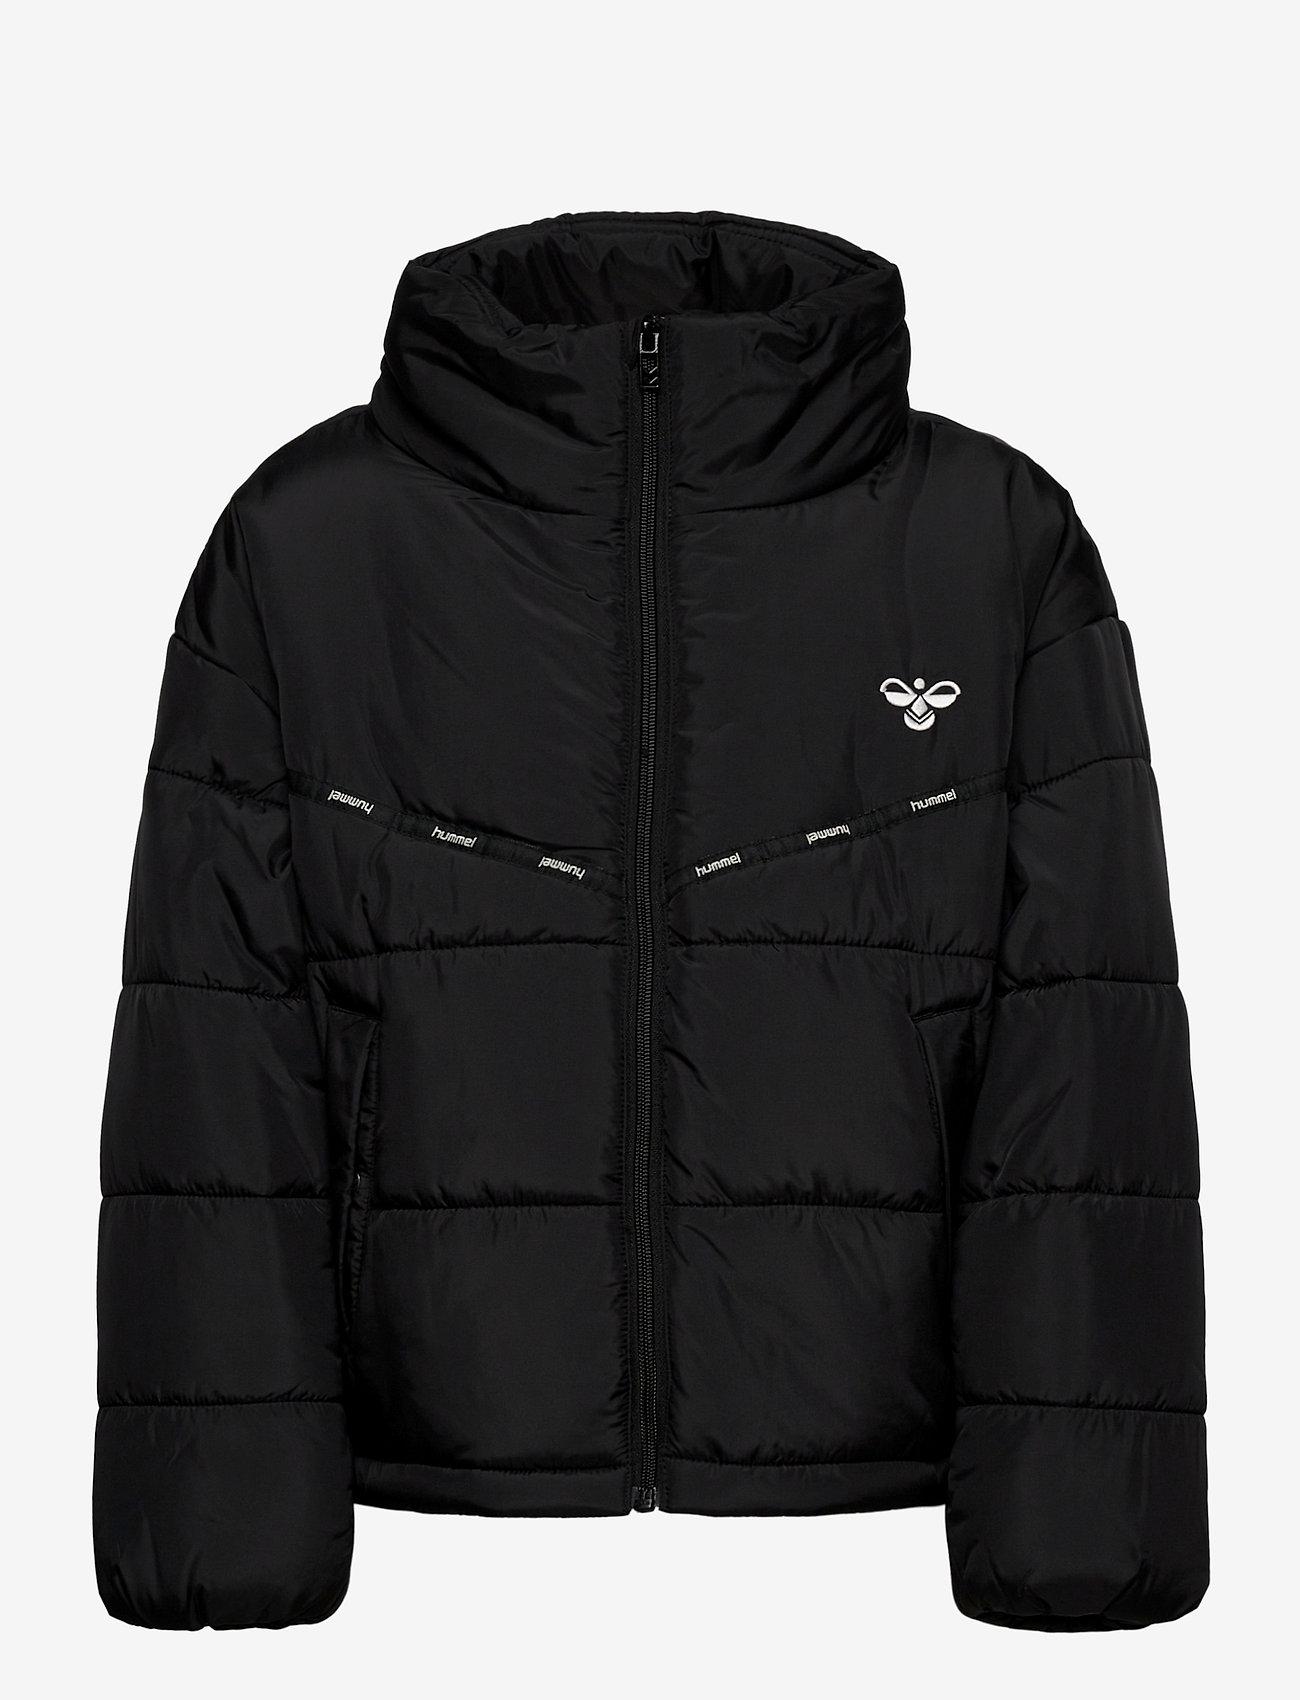 Hummel - hmlVIBRANT JACKET - insulated jackets - black - 1